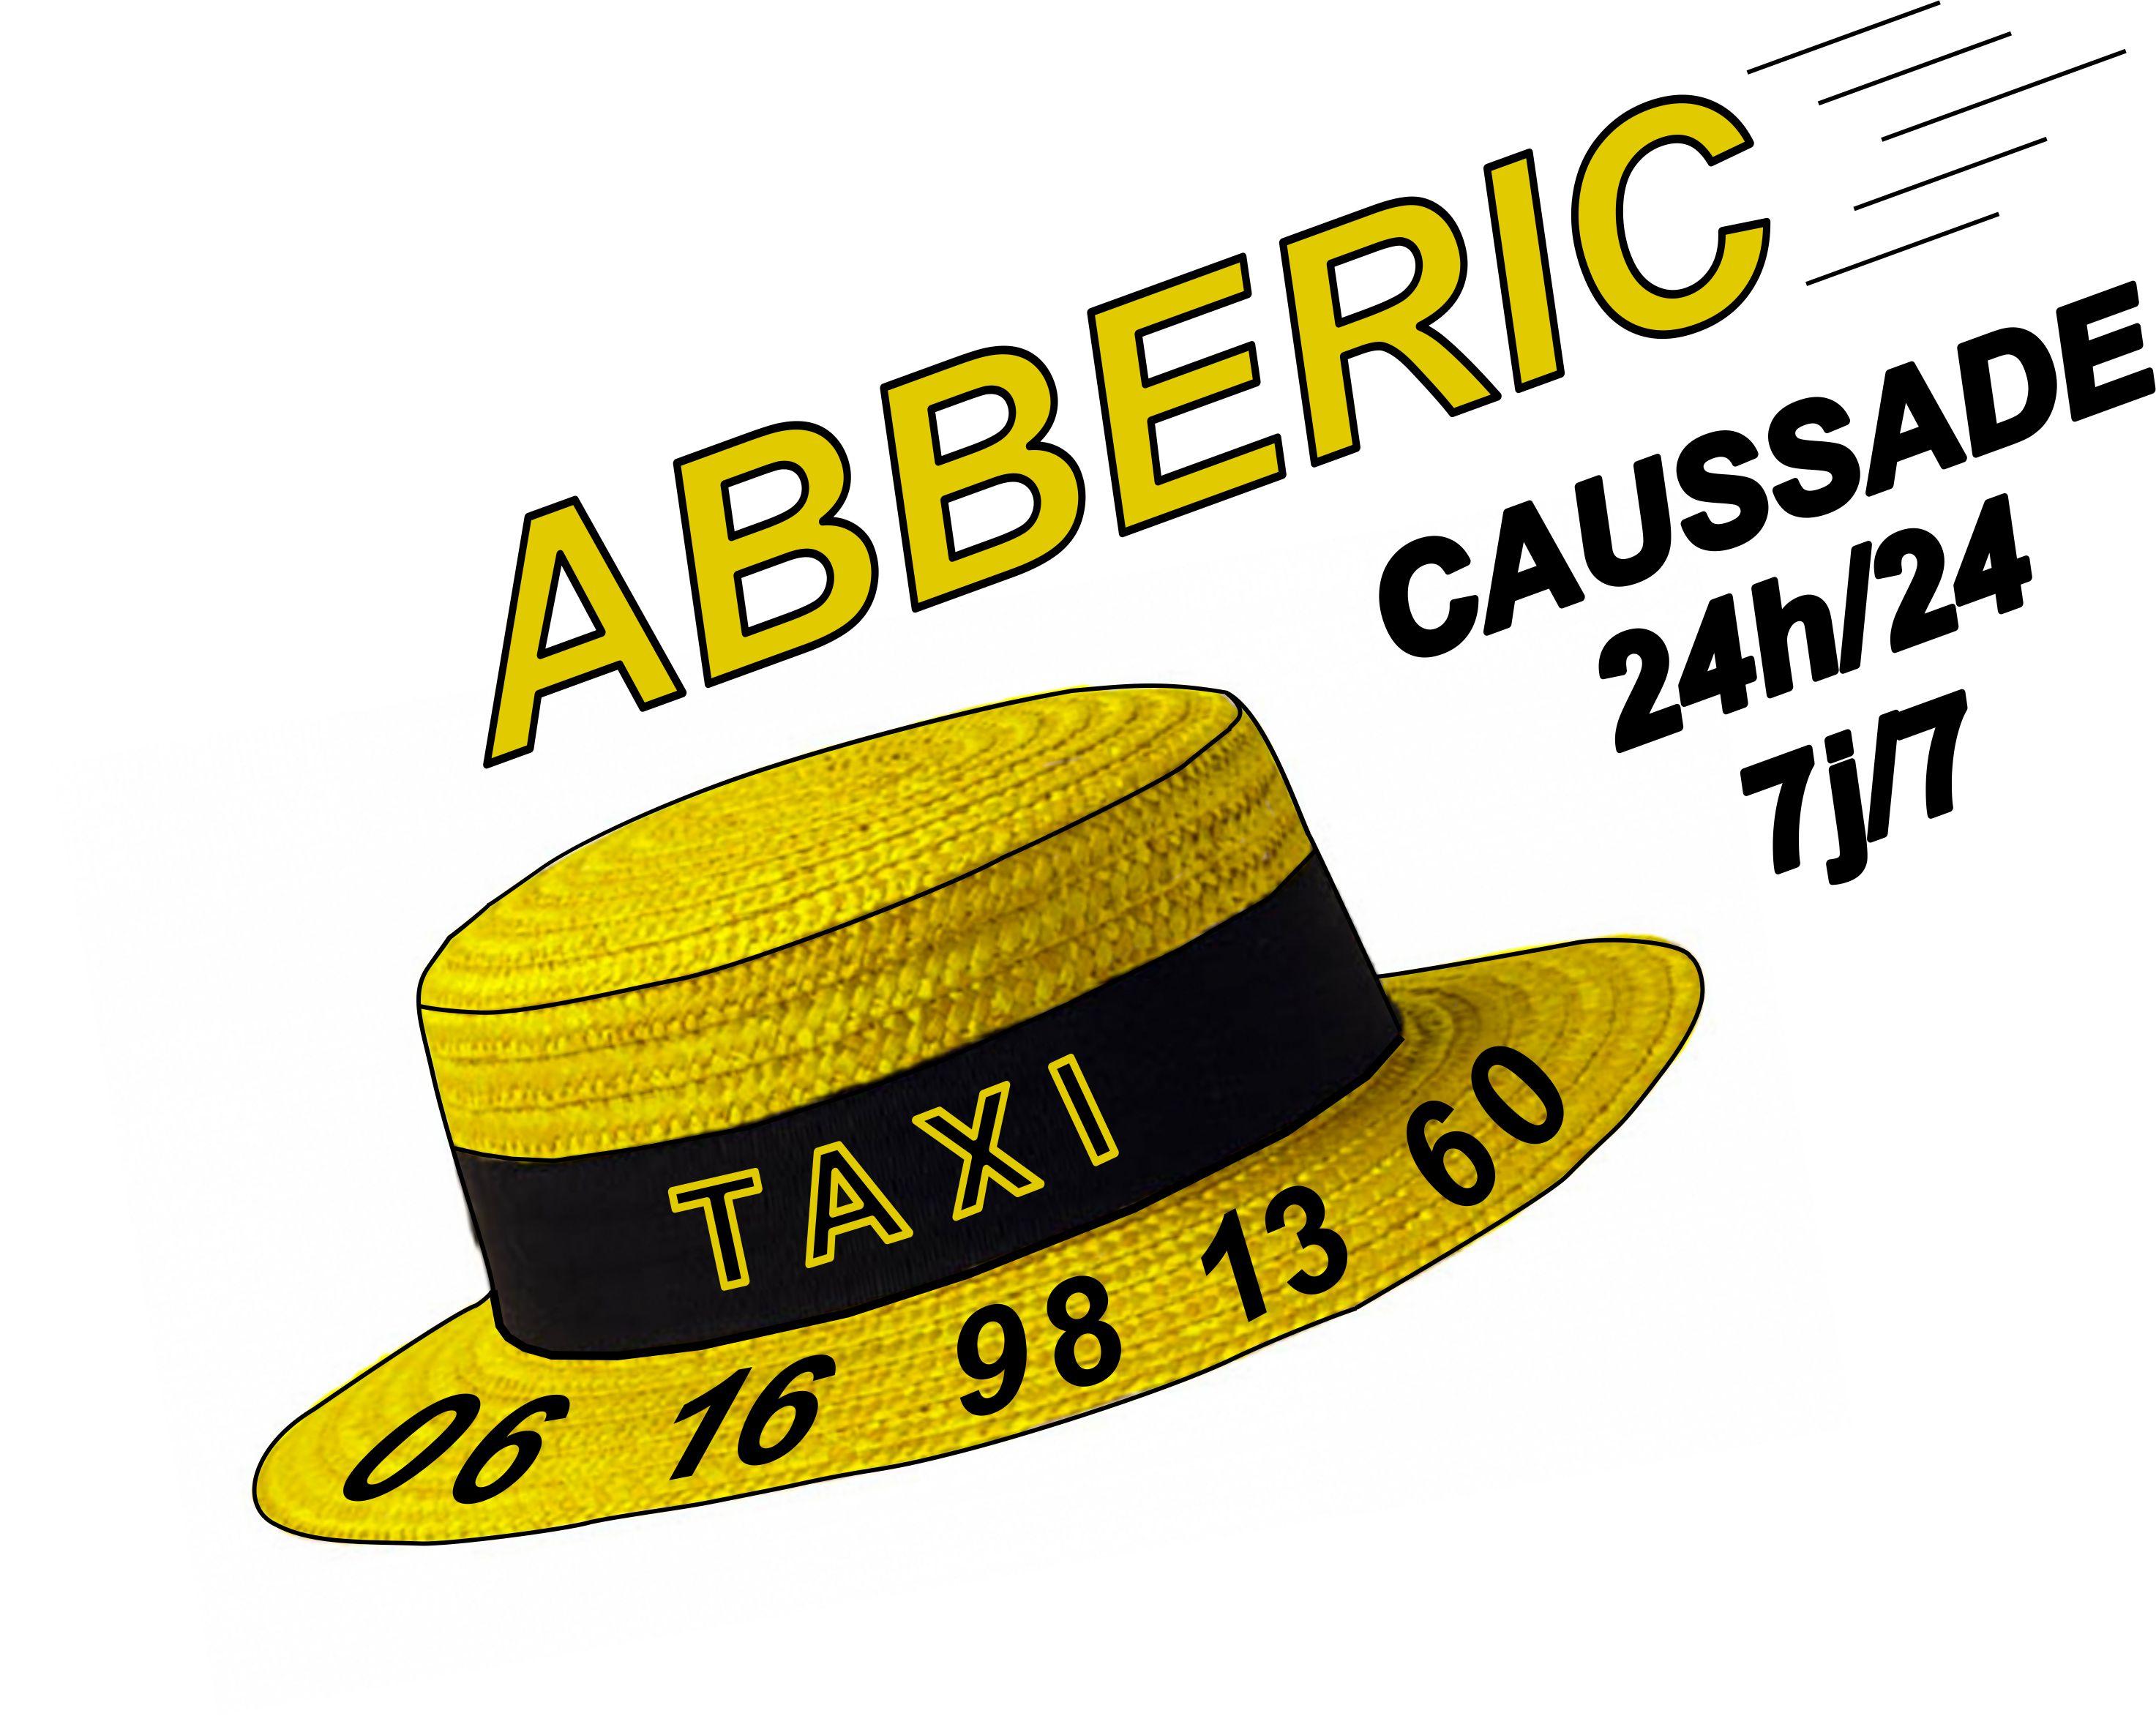 ABBERIC